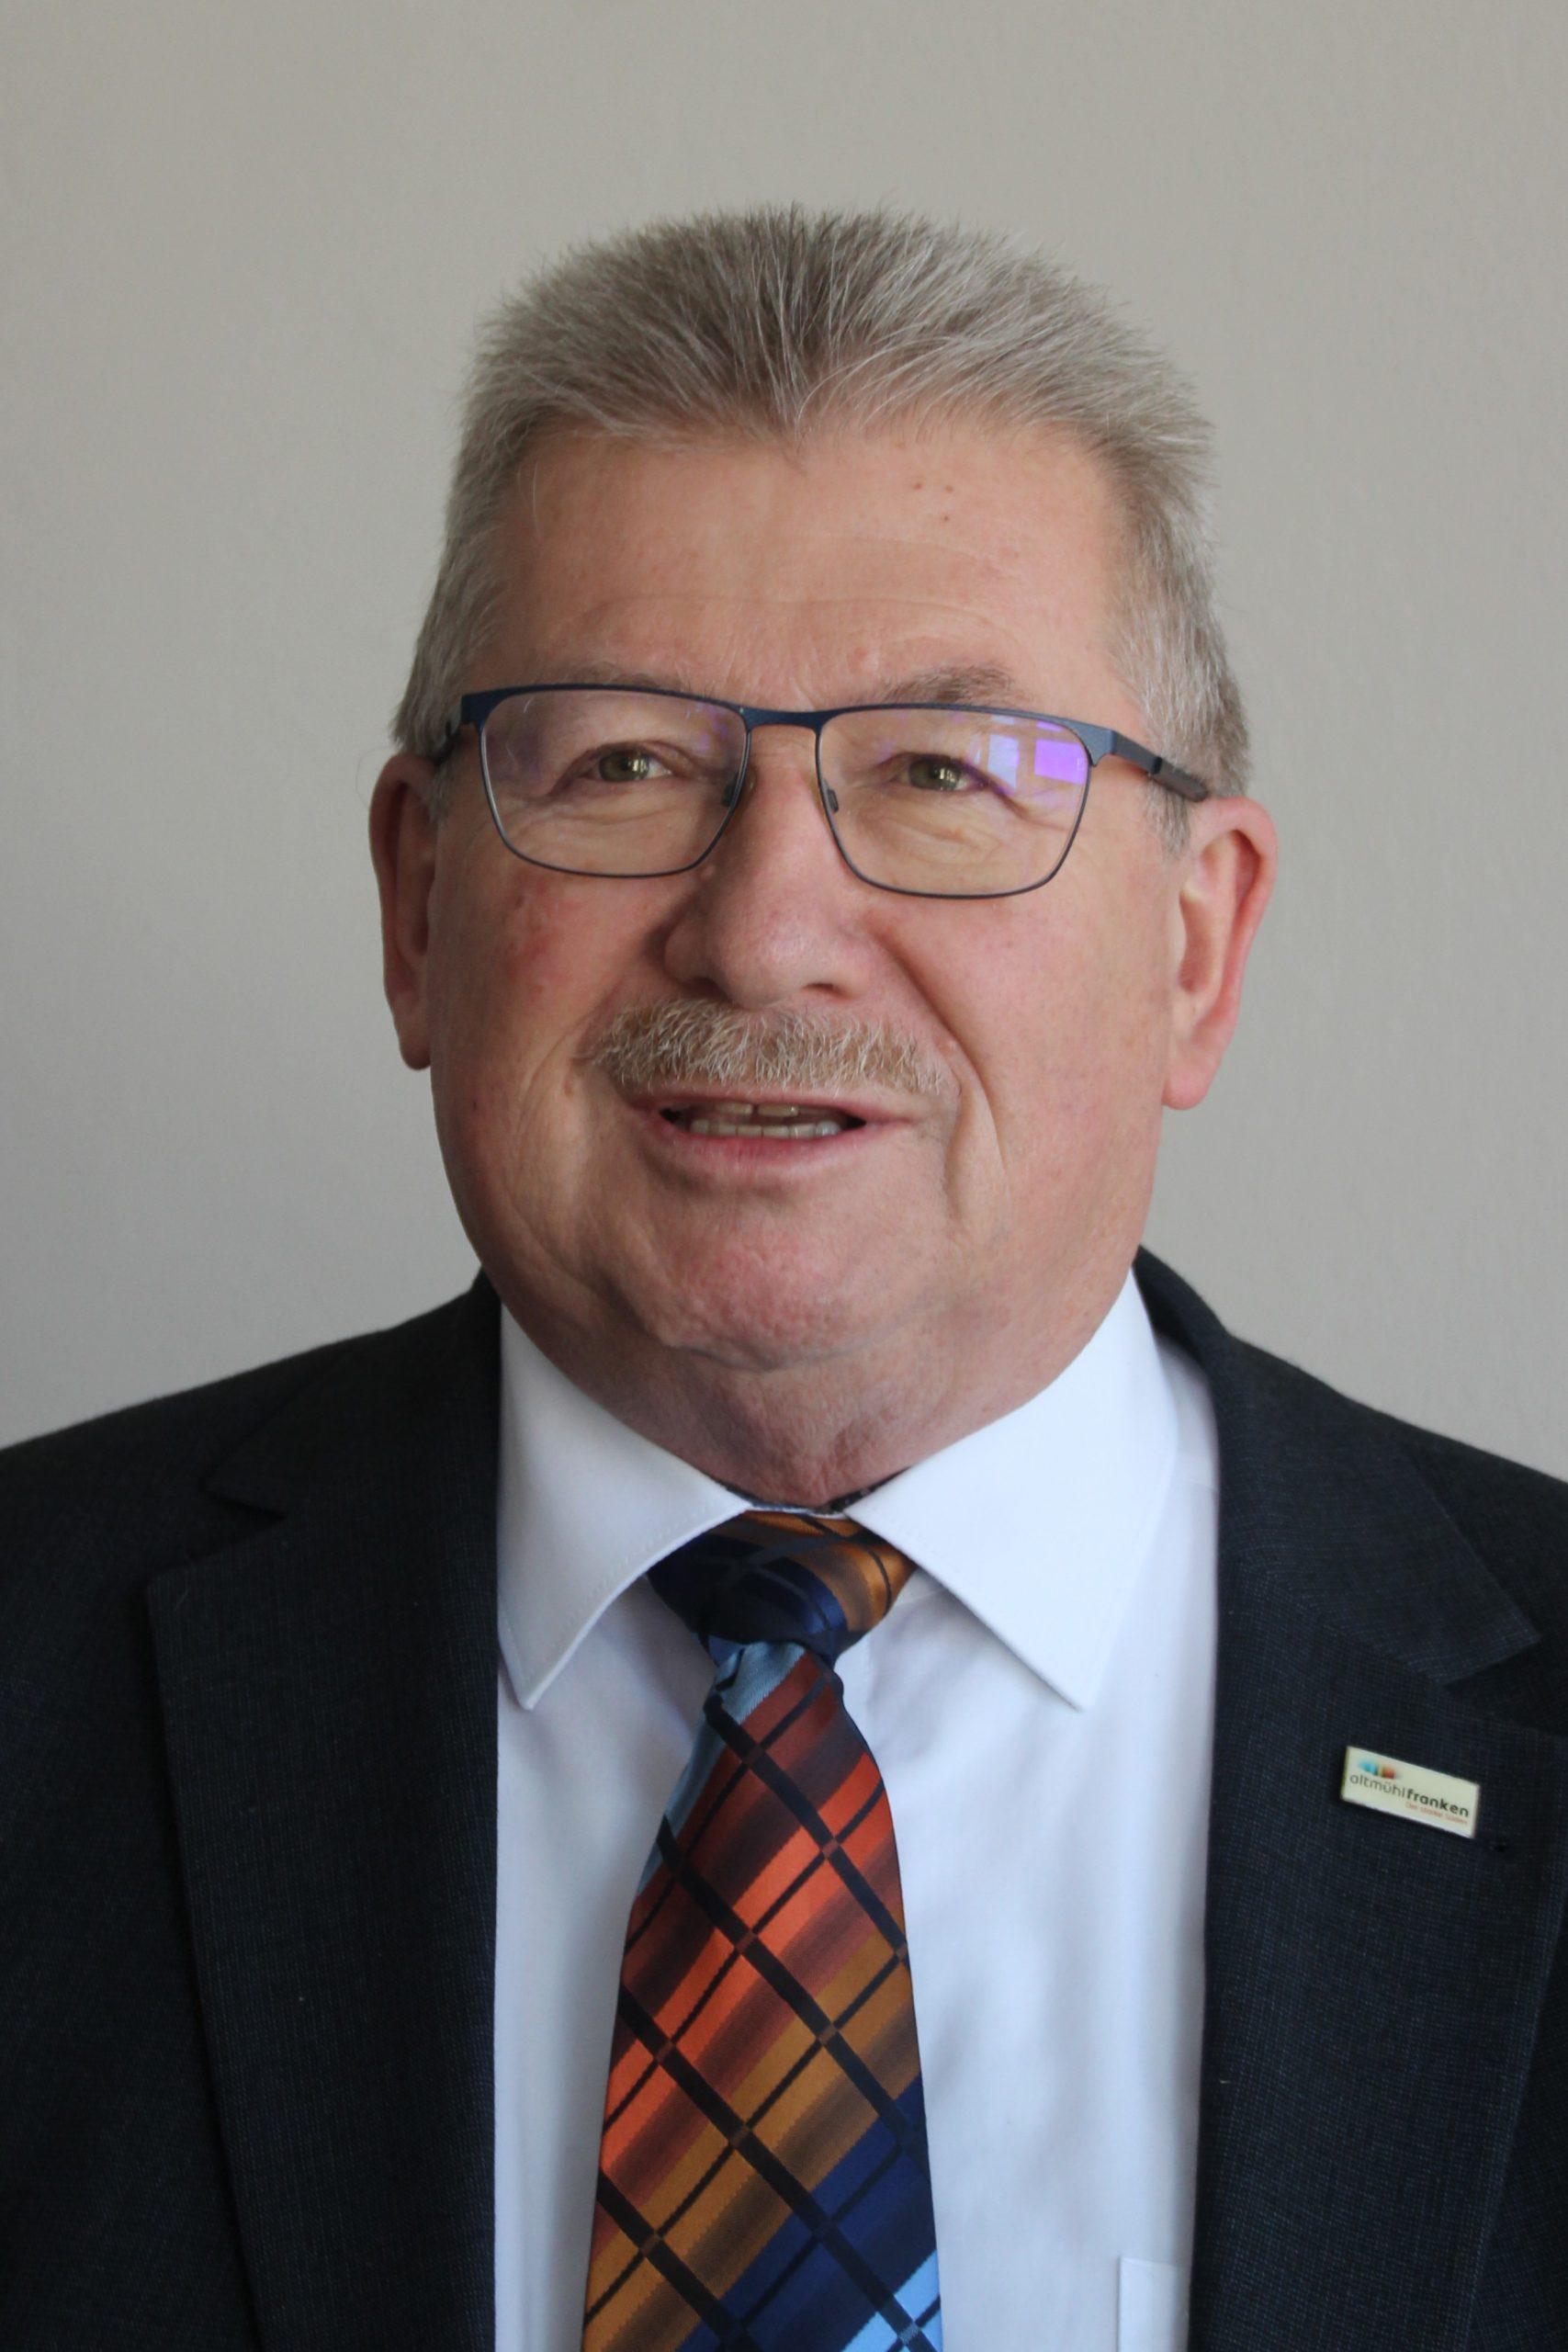 Landrat Gerhard Wägemann